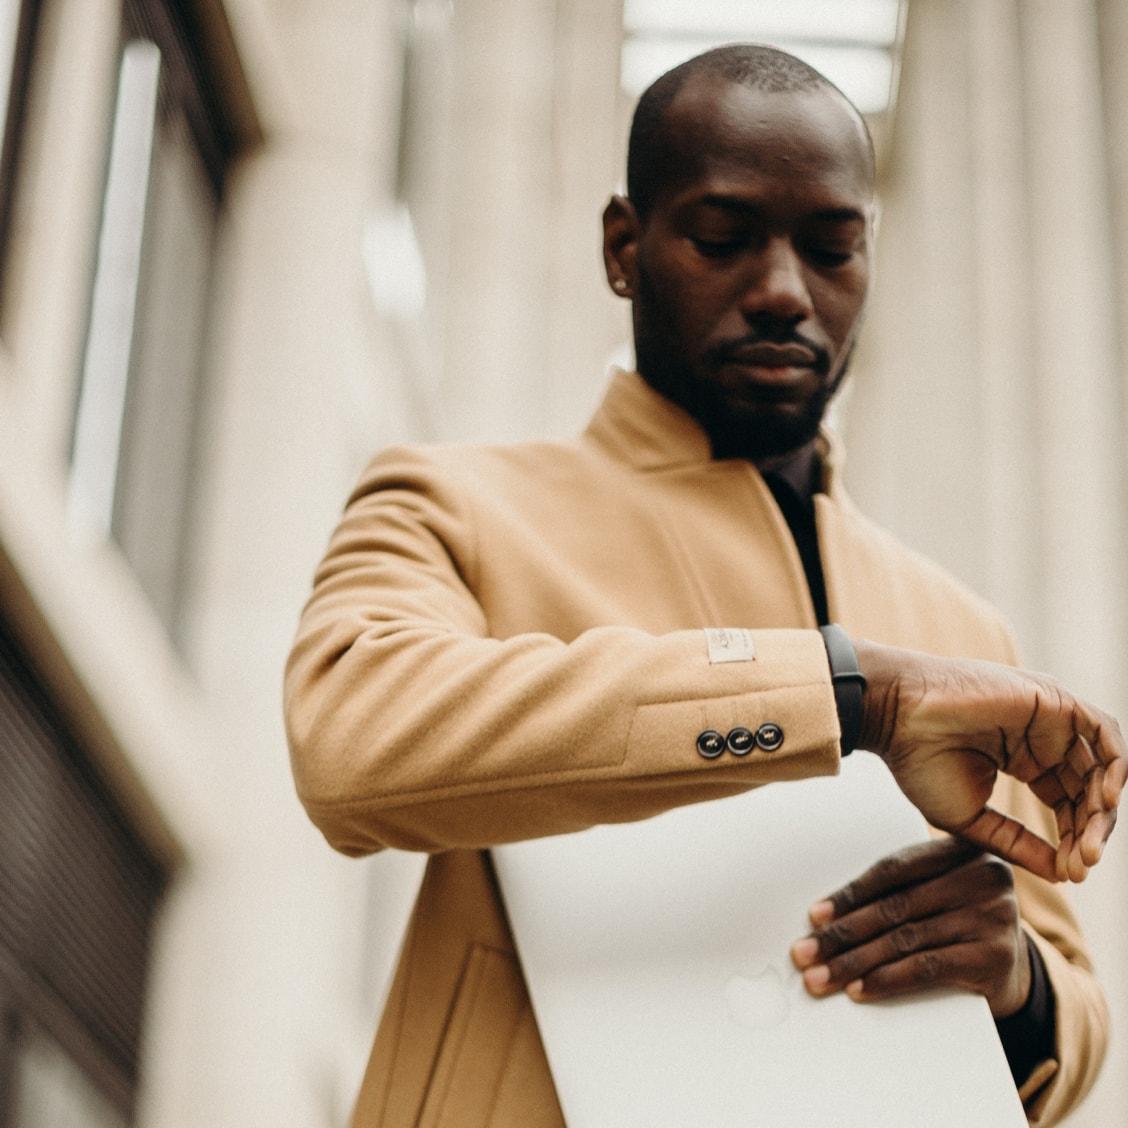 Businessperson looking at wrist watch